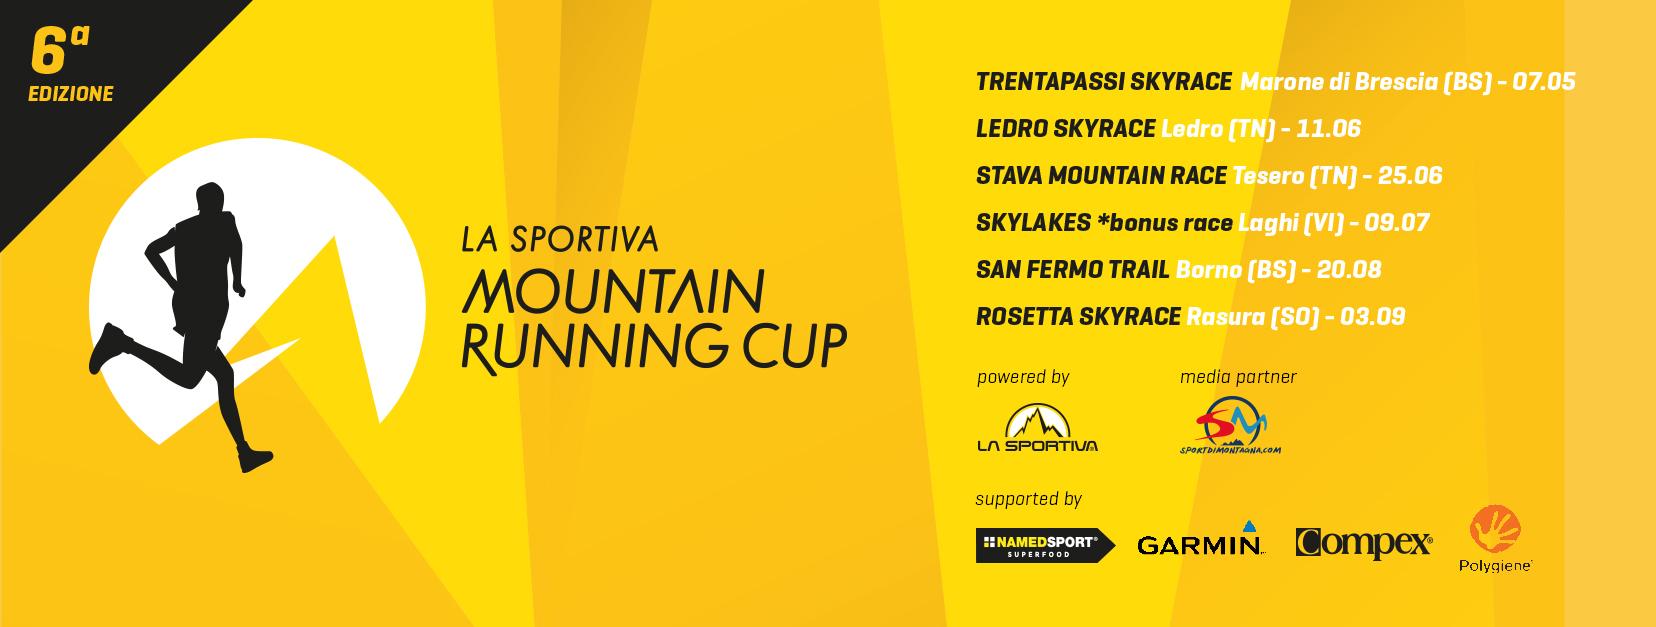 Skylakes - Skyrace - La Sportiva Mountain running cup